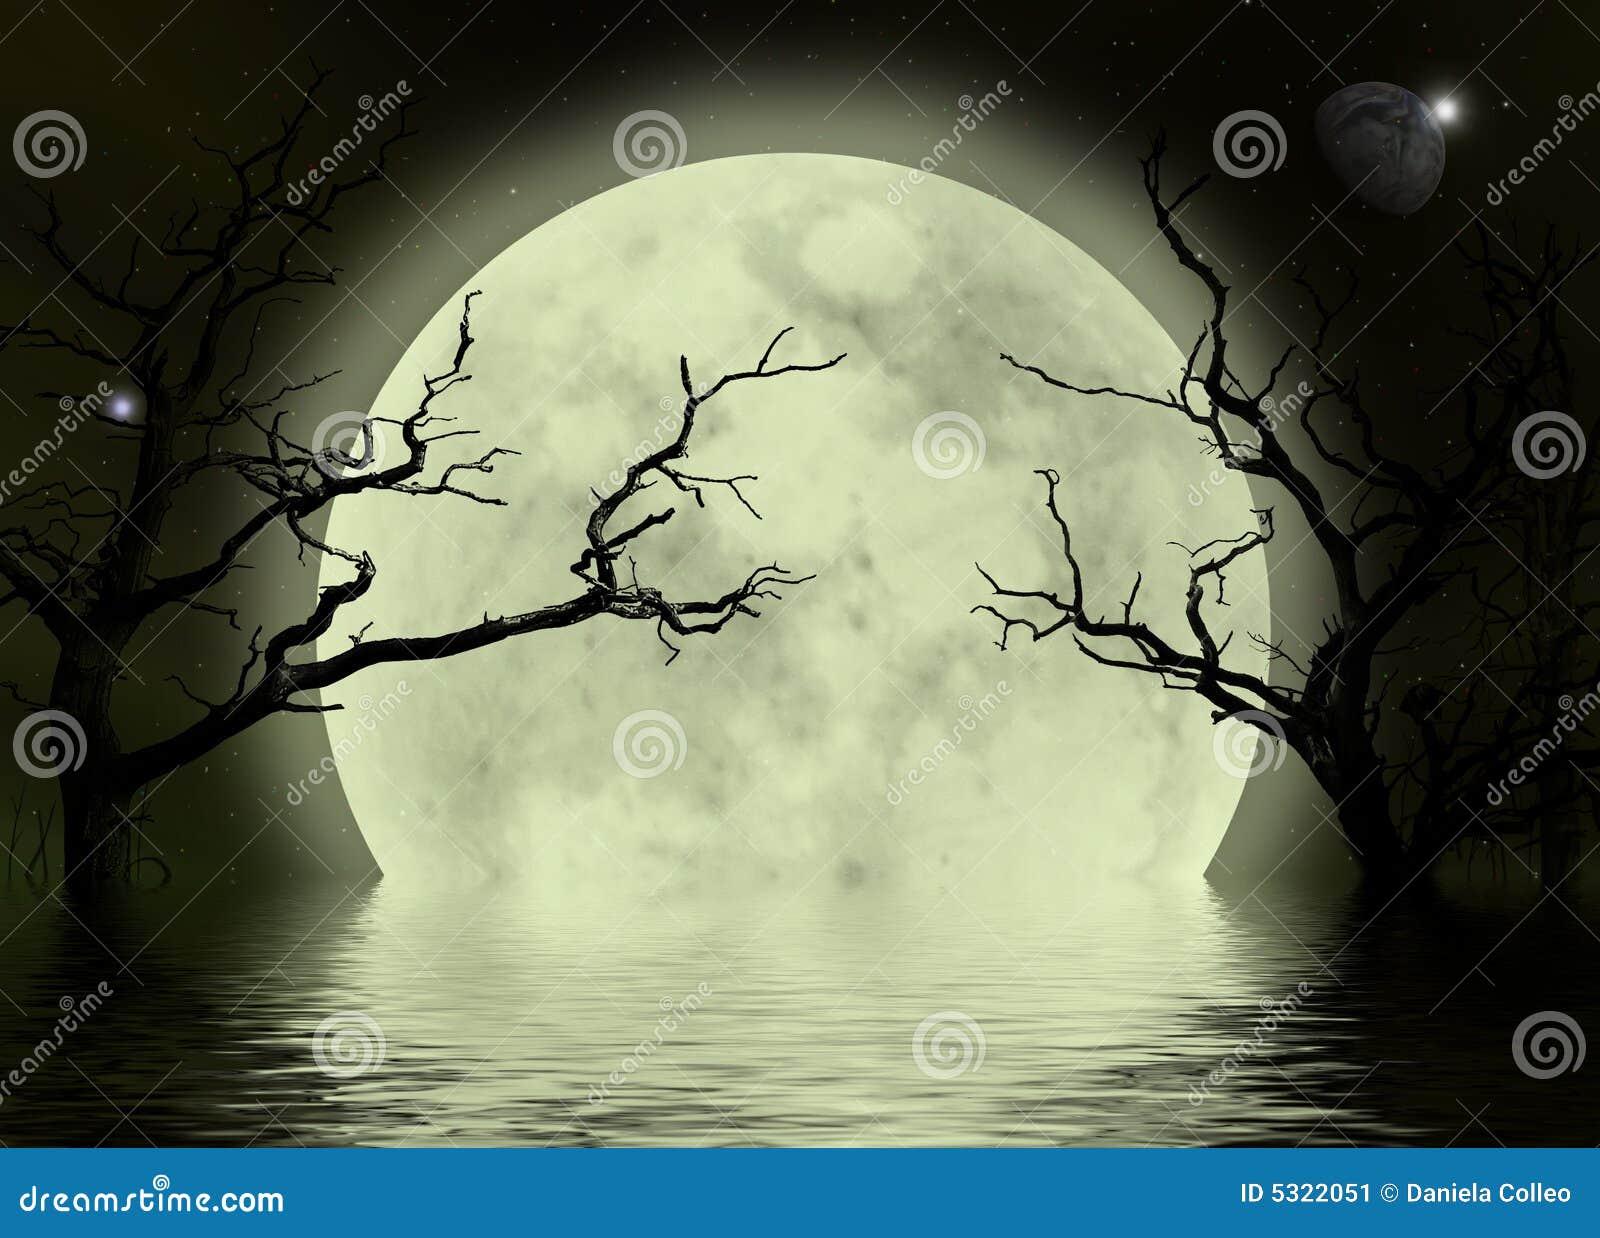 Moon scary fantasy background